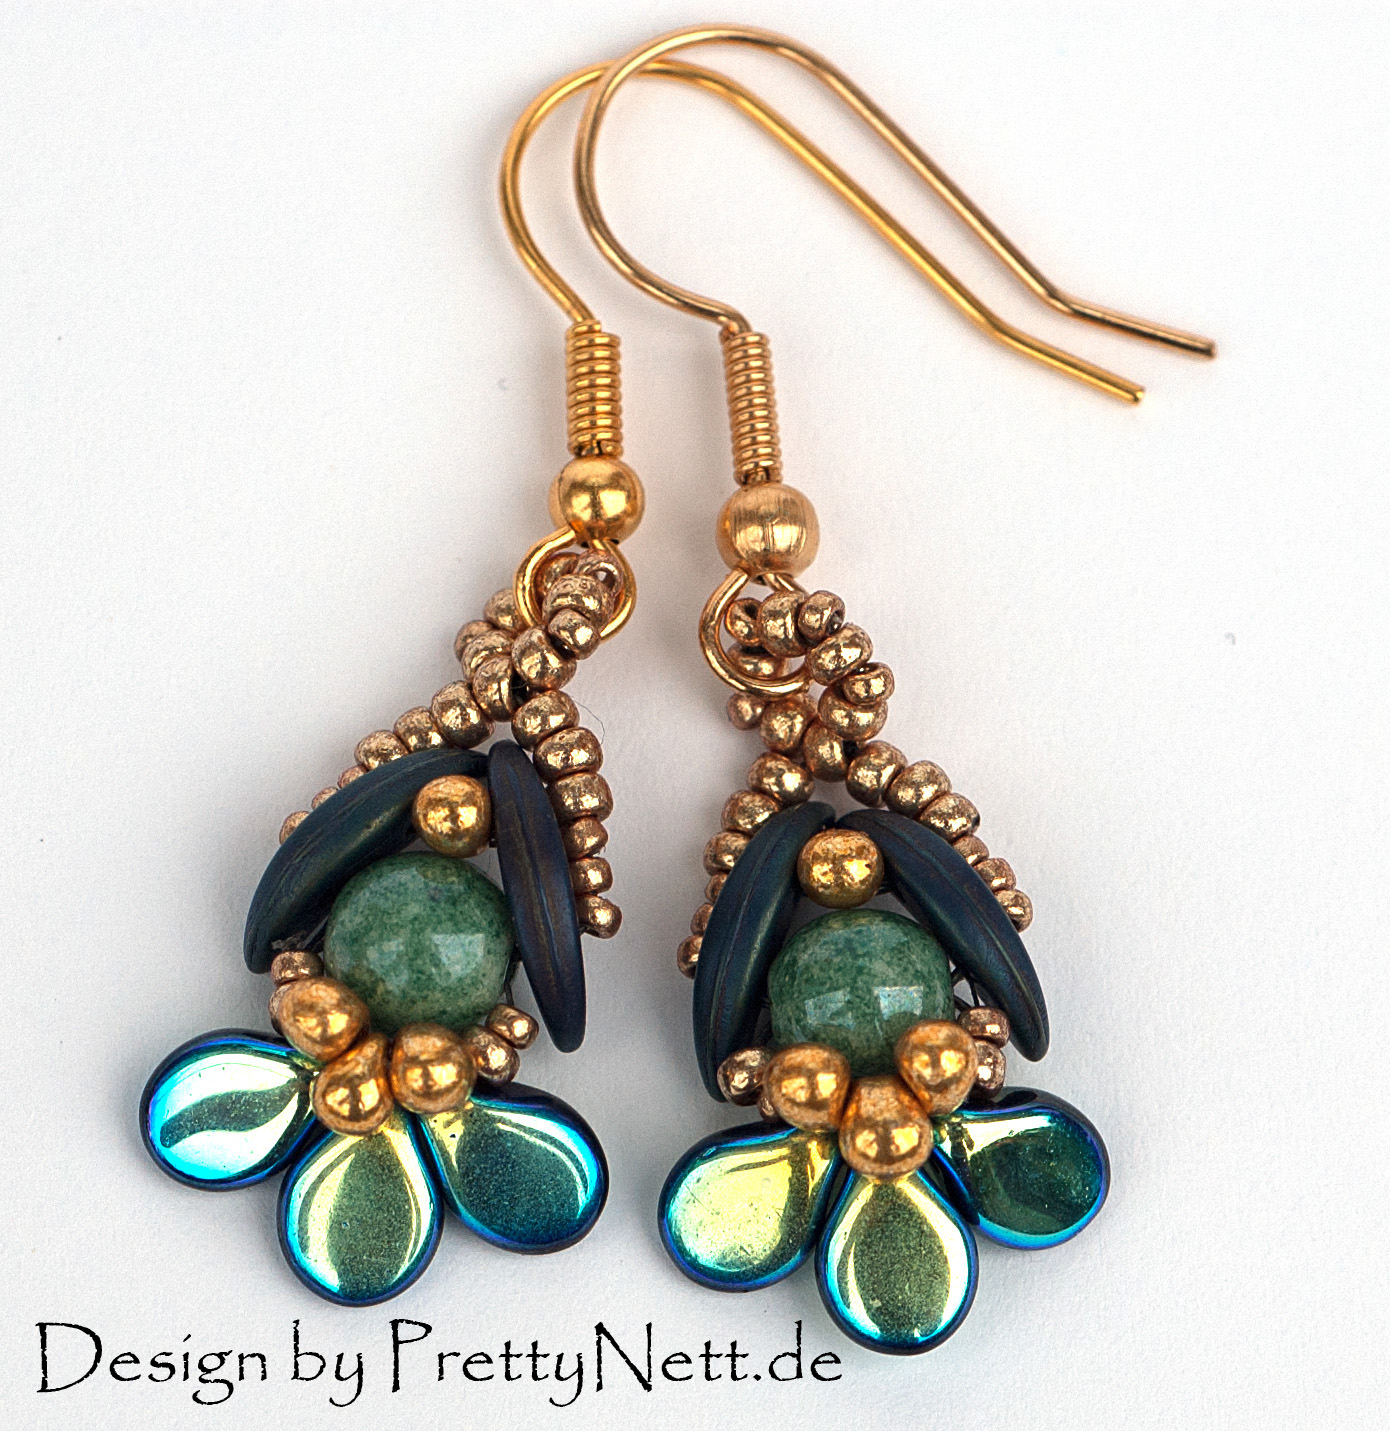 4 Pip Beaded Earrings Tutorials to Try! - The Beading Gem ...